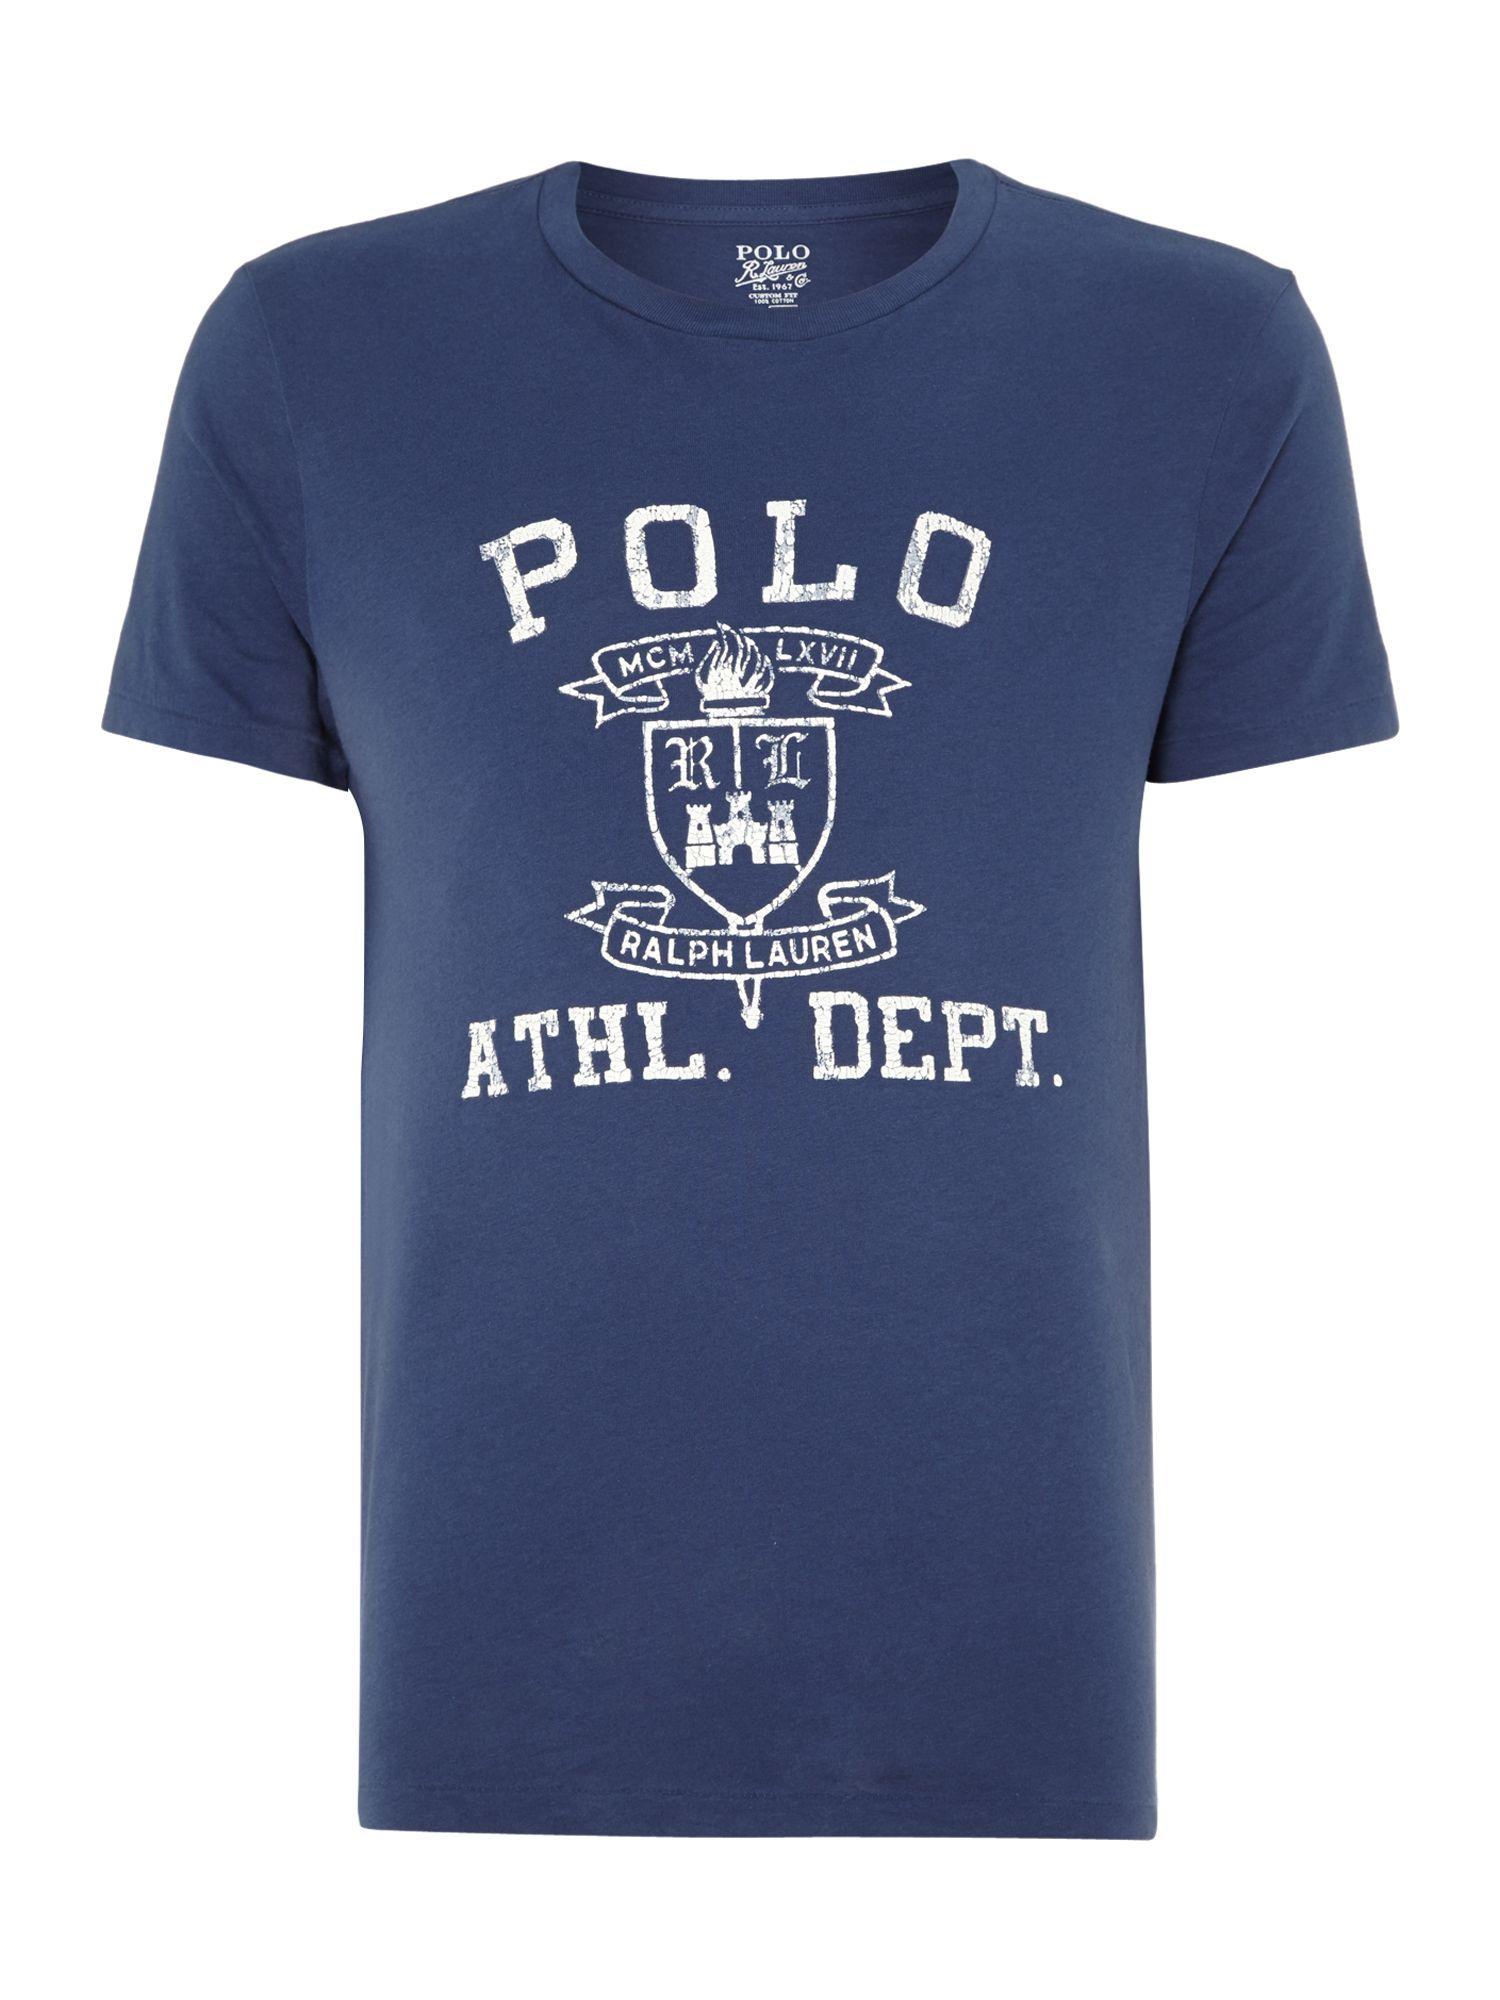 Polo ralph lauren polo athletics logo print custom fit t for Polo custom fit t shirts